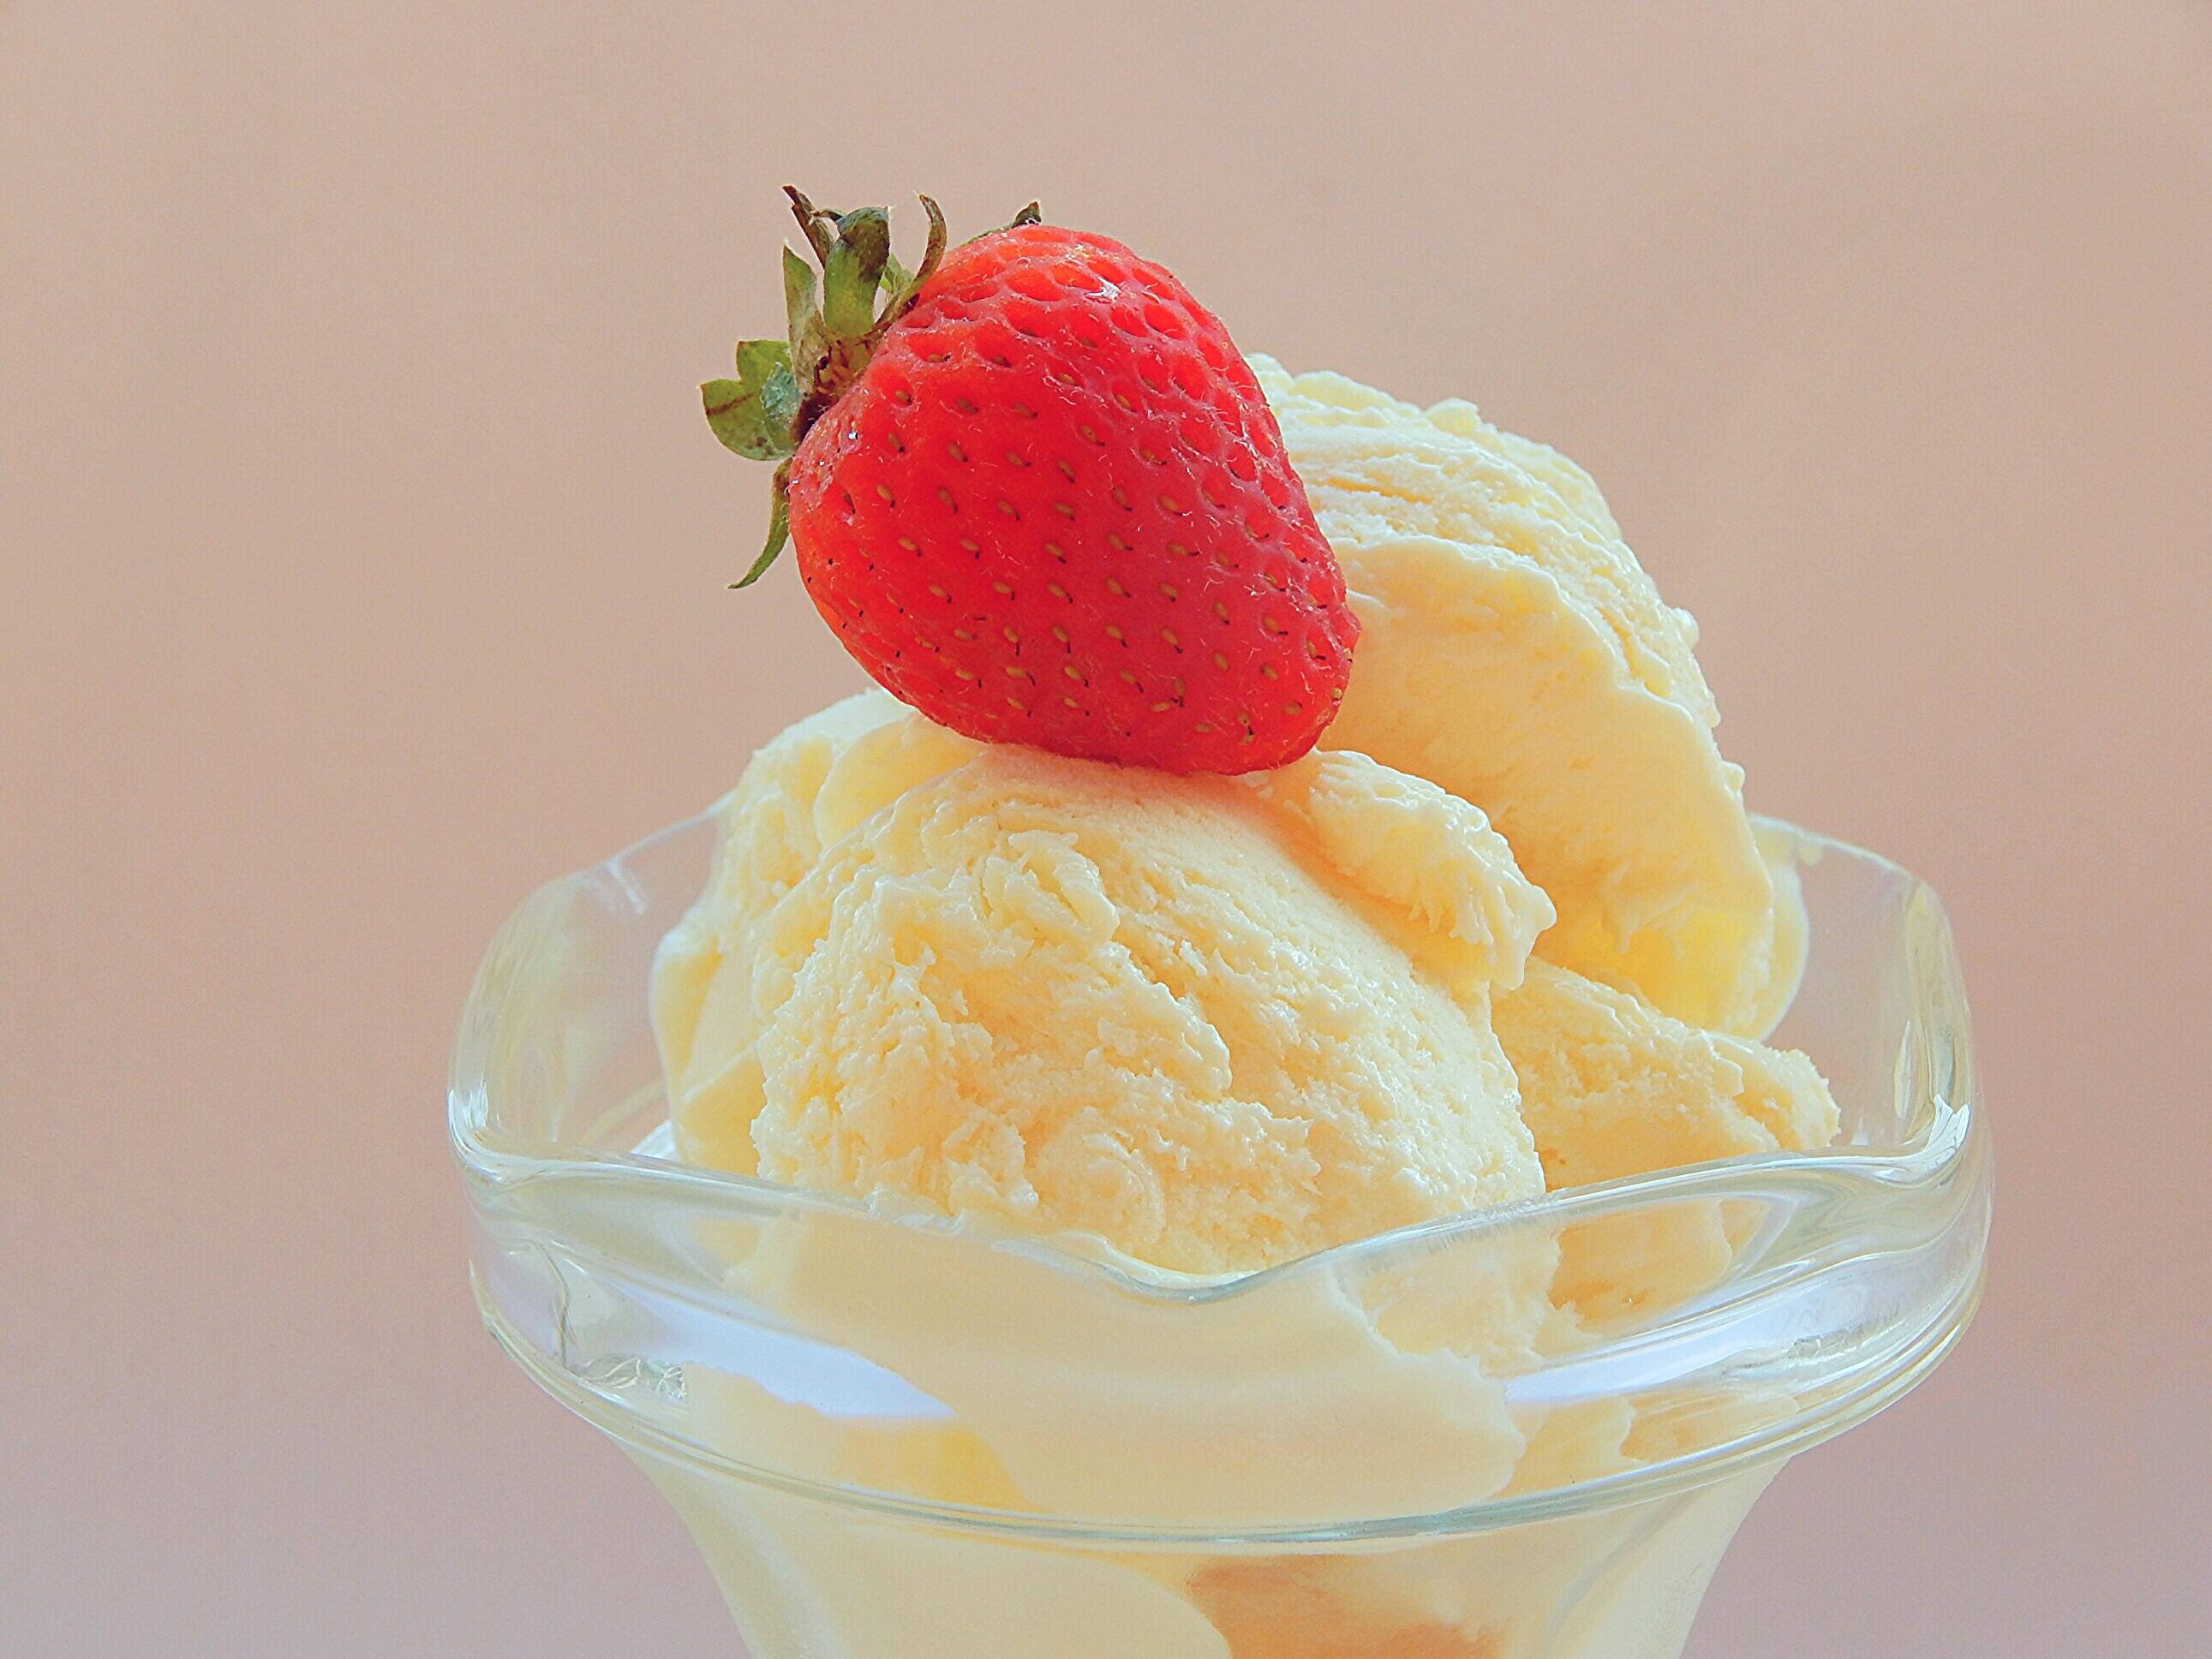 Diy vanilla ice cream domo ice cream powder img20140804085845 ccuart Image collections